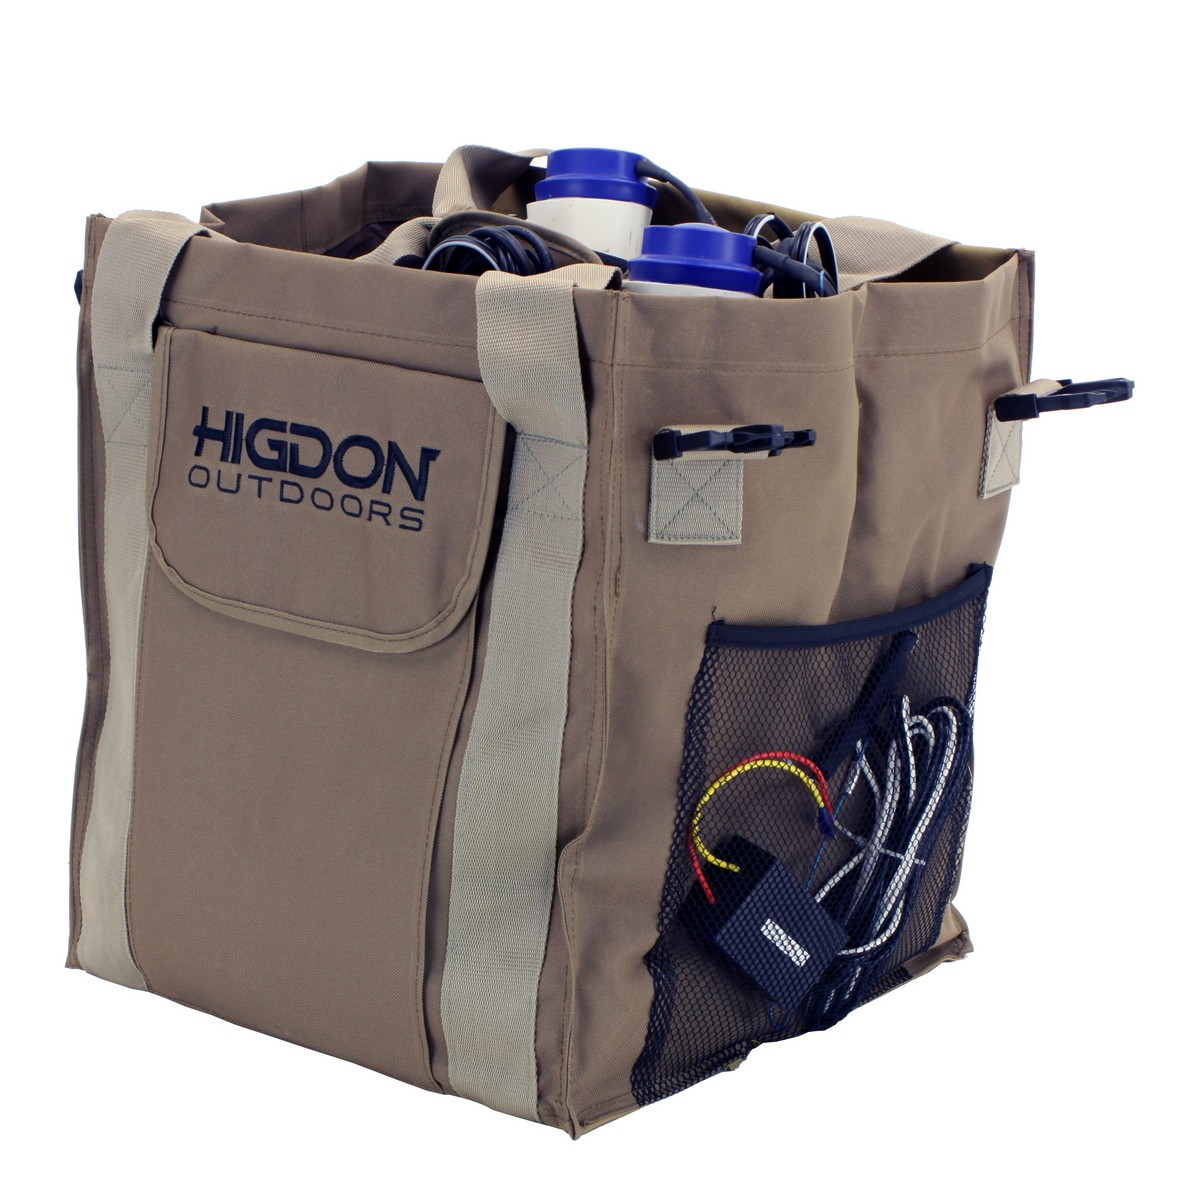 Higdon Outdoors Pulsator 2 Plug-n-Hunt Hardwire 4-Decoy System